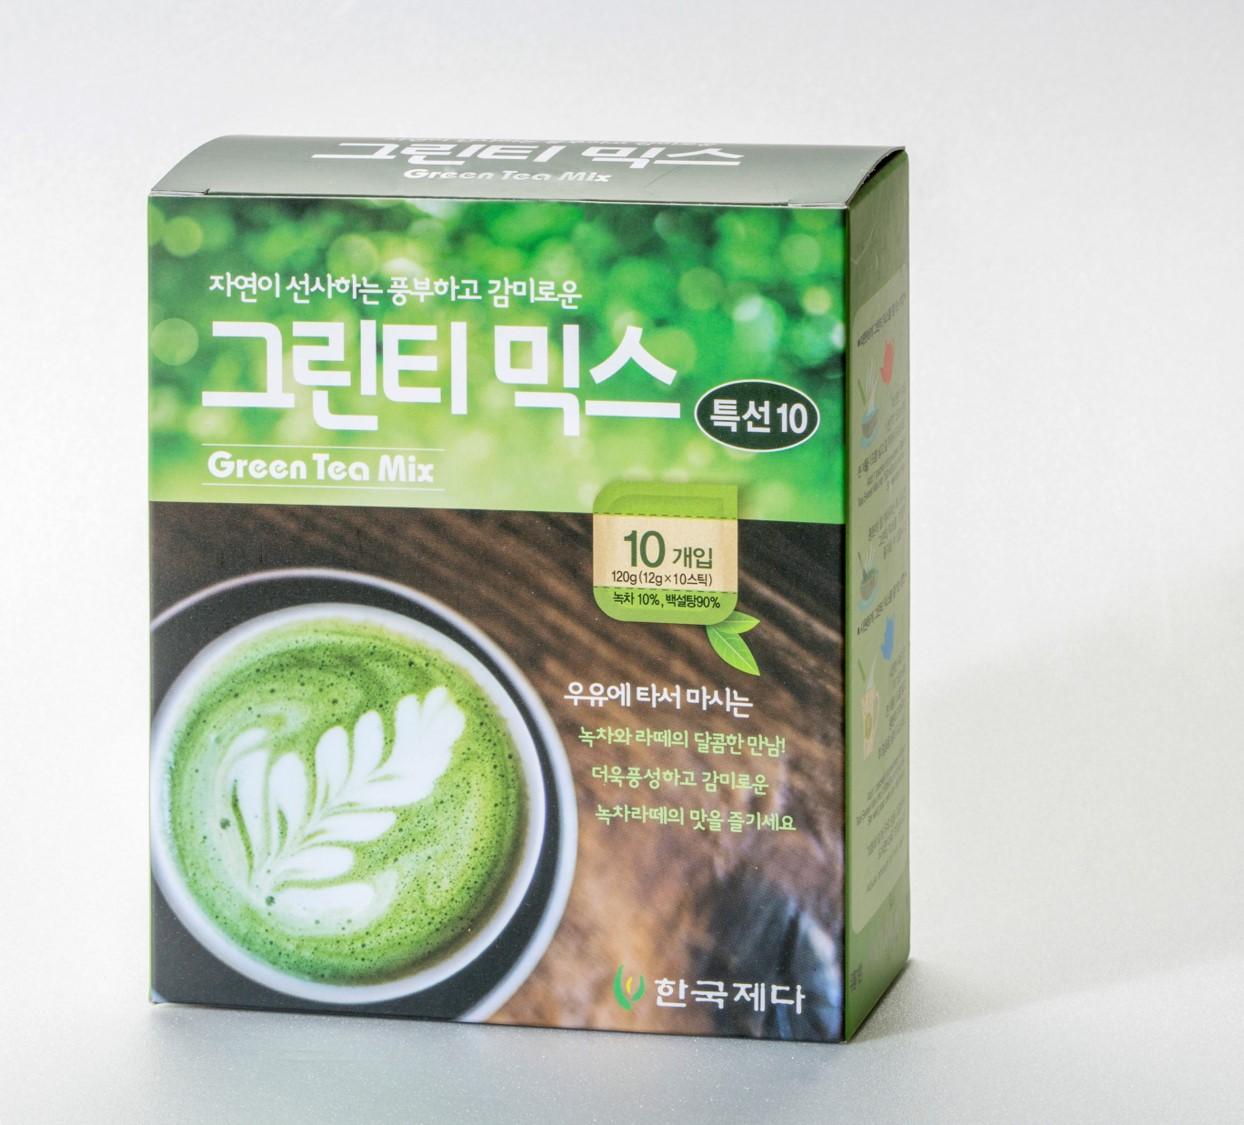 Green tea mix. Green tea latte.